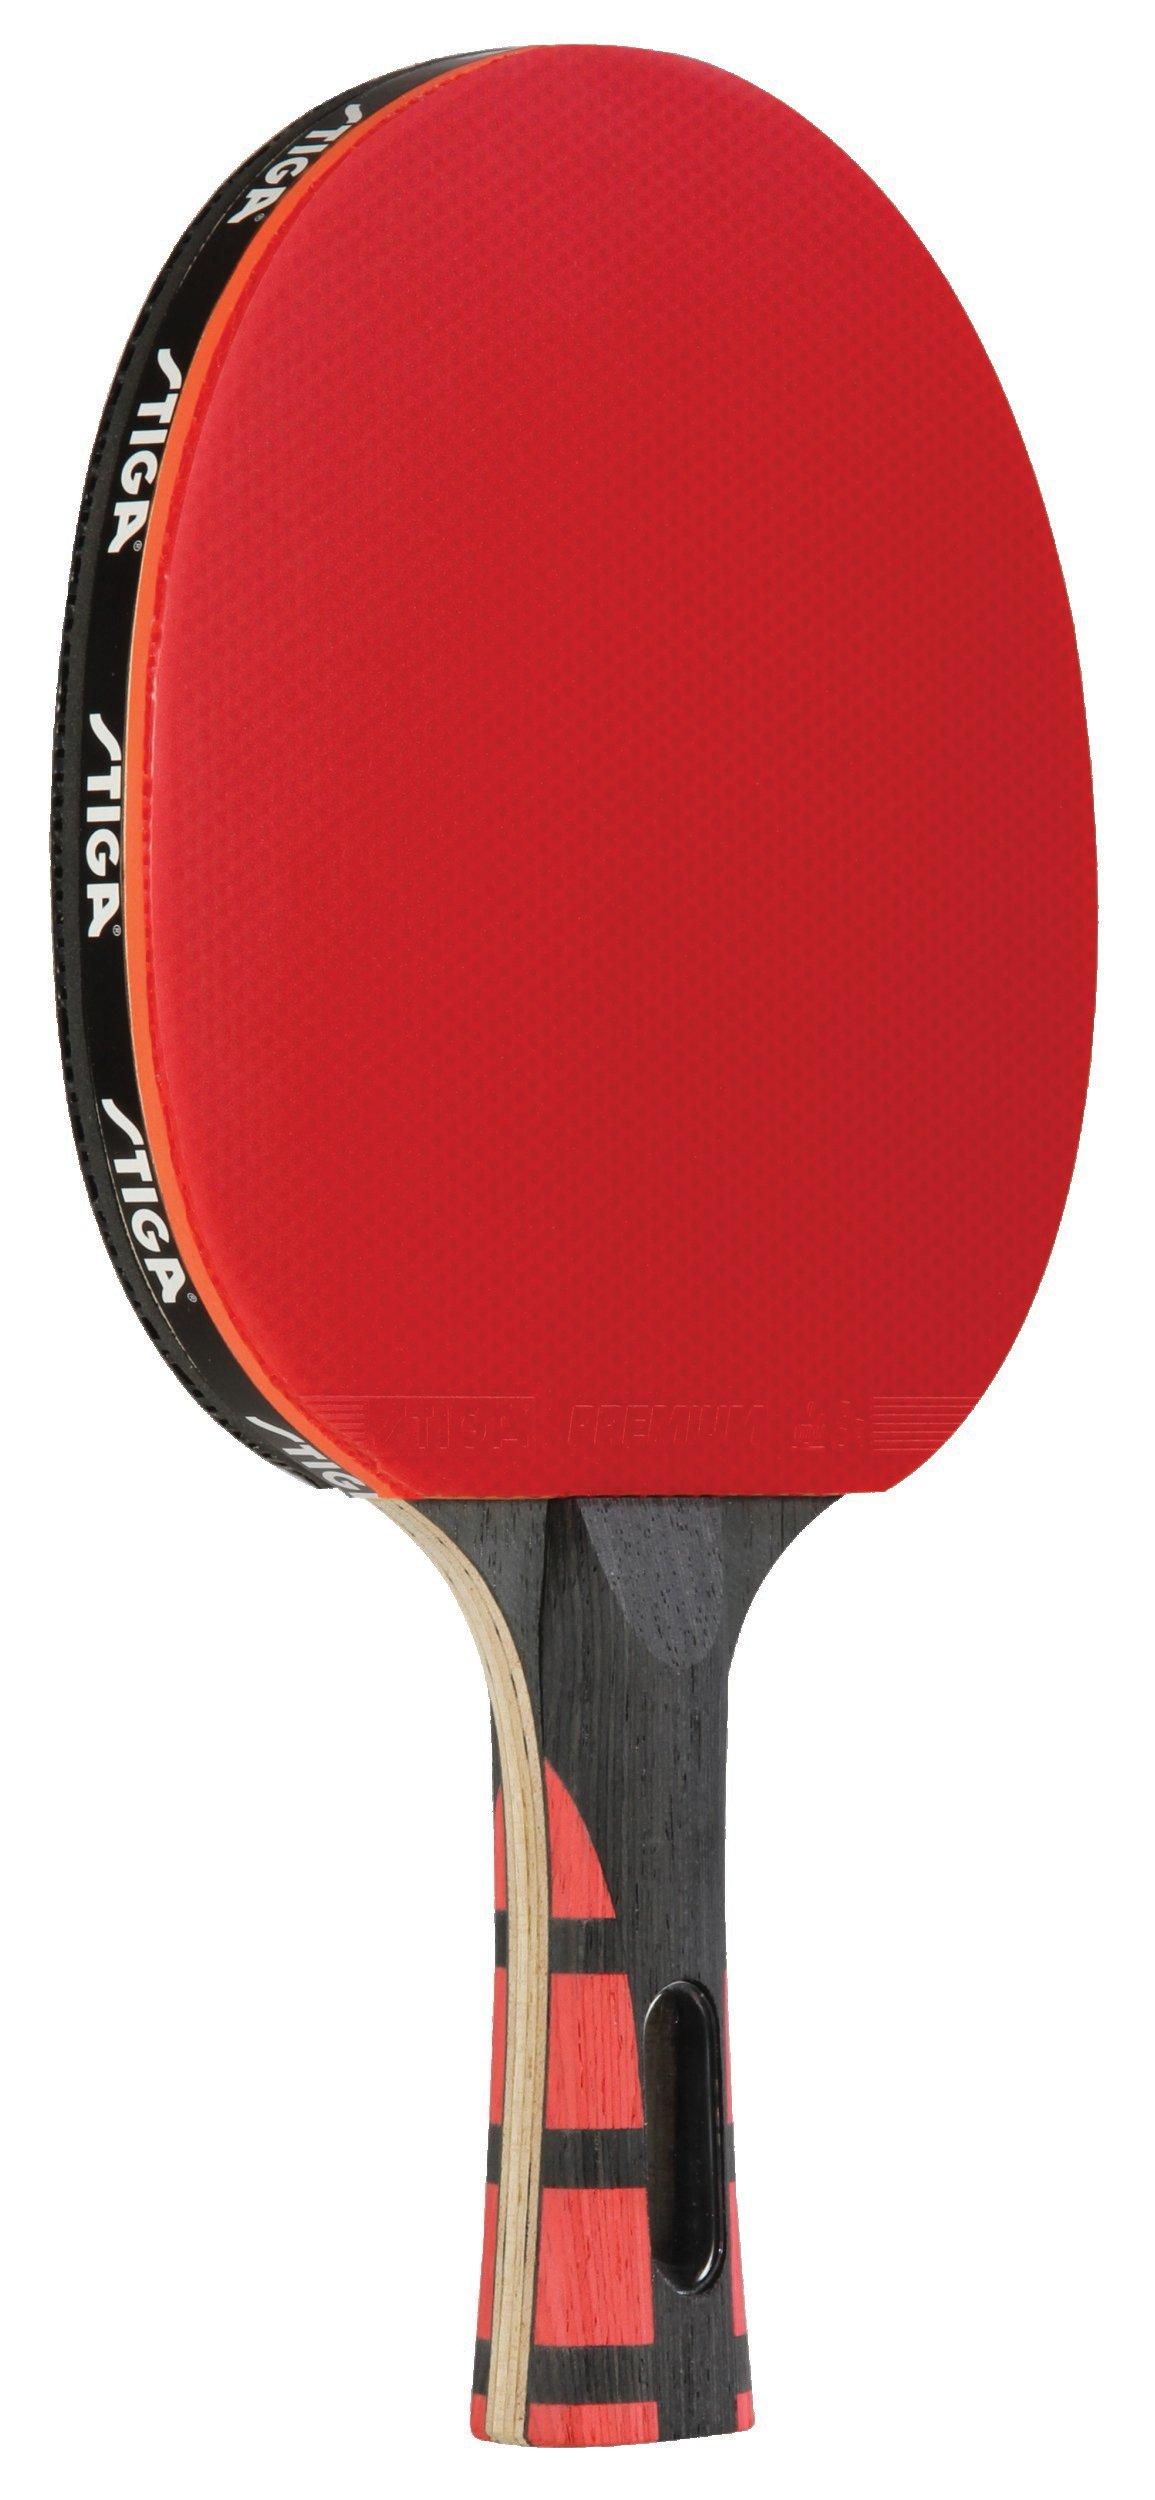 Stiga Evolution Table Tennis Racket product image